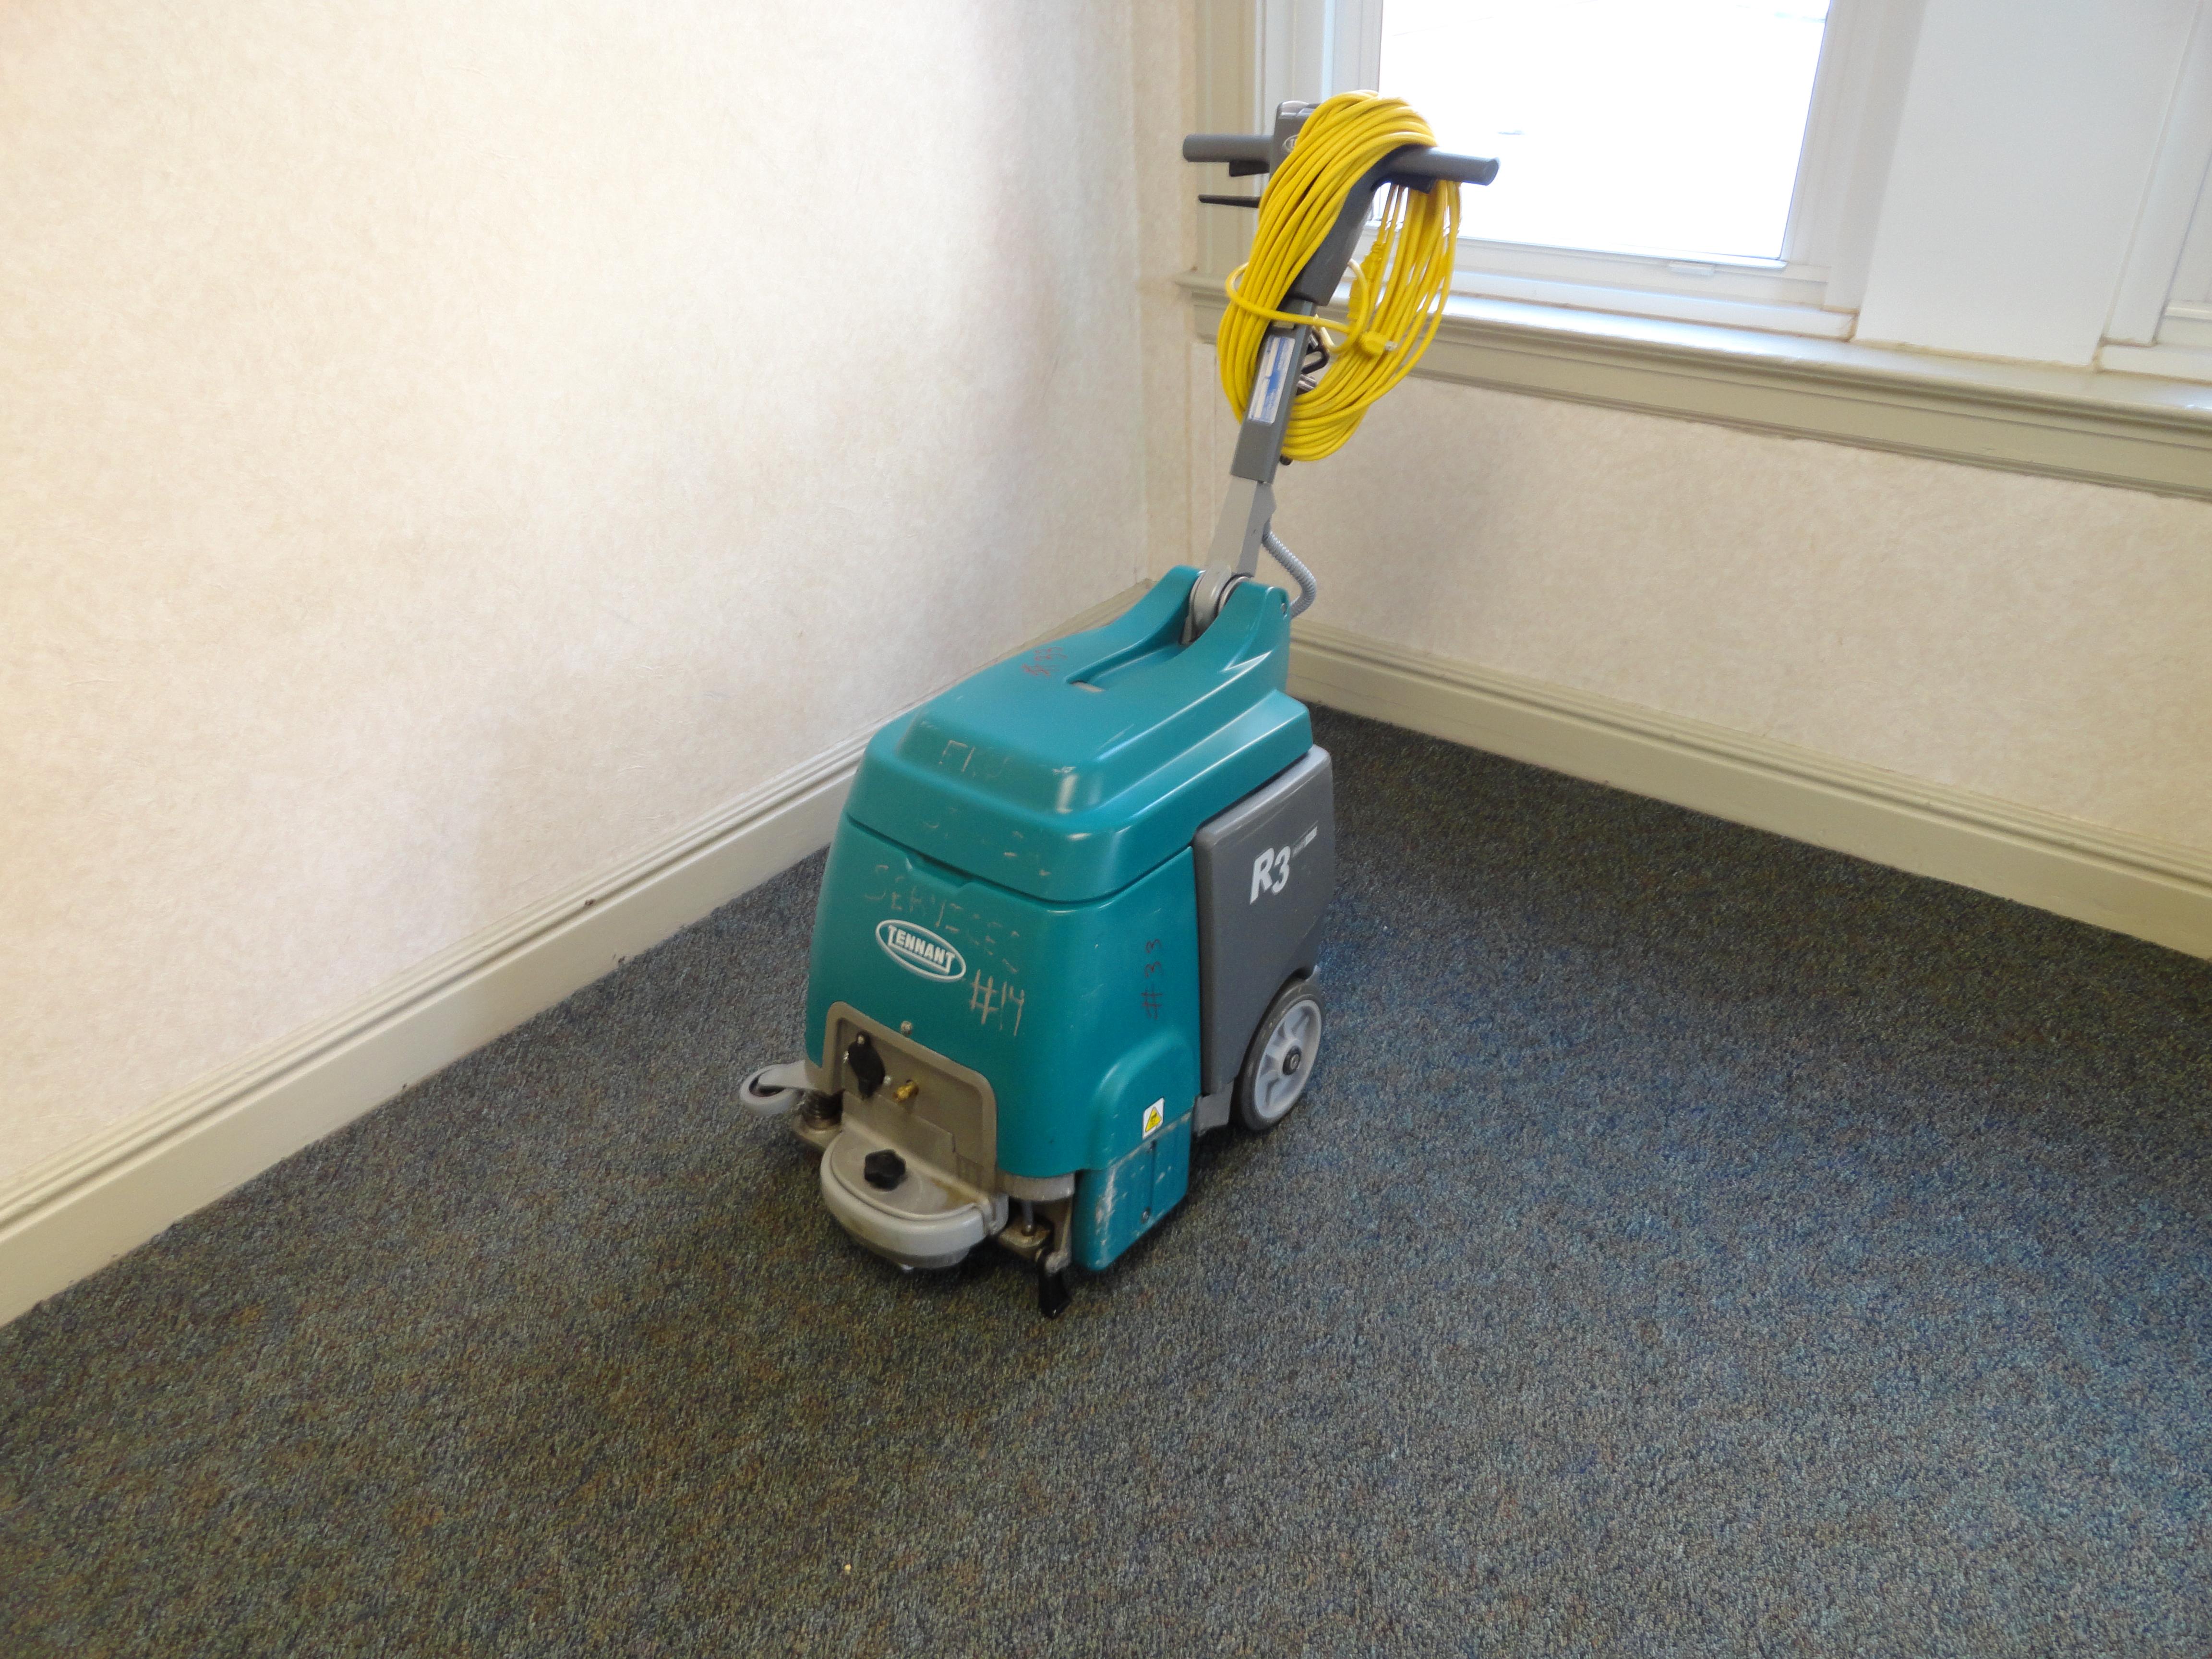 Upright carpet cleaner